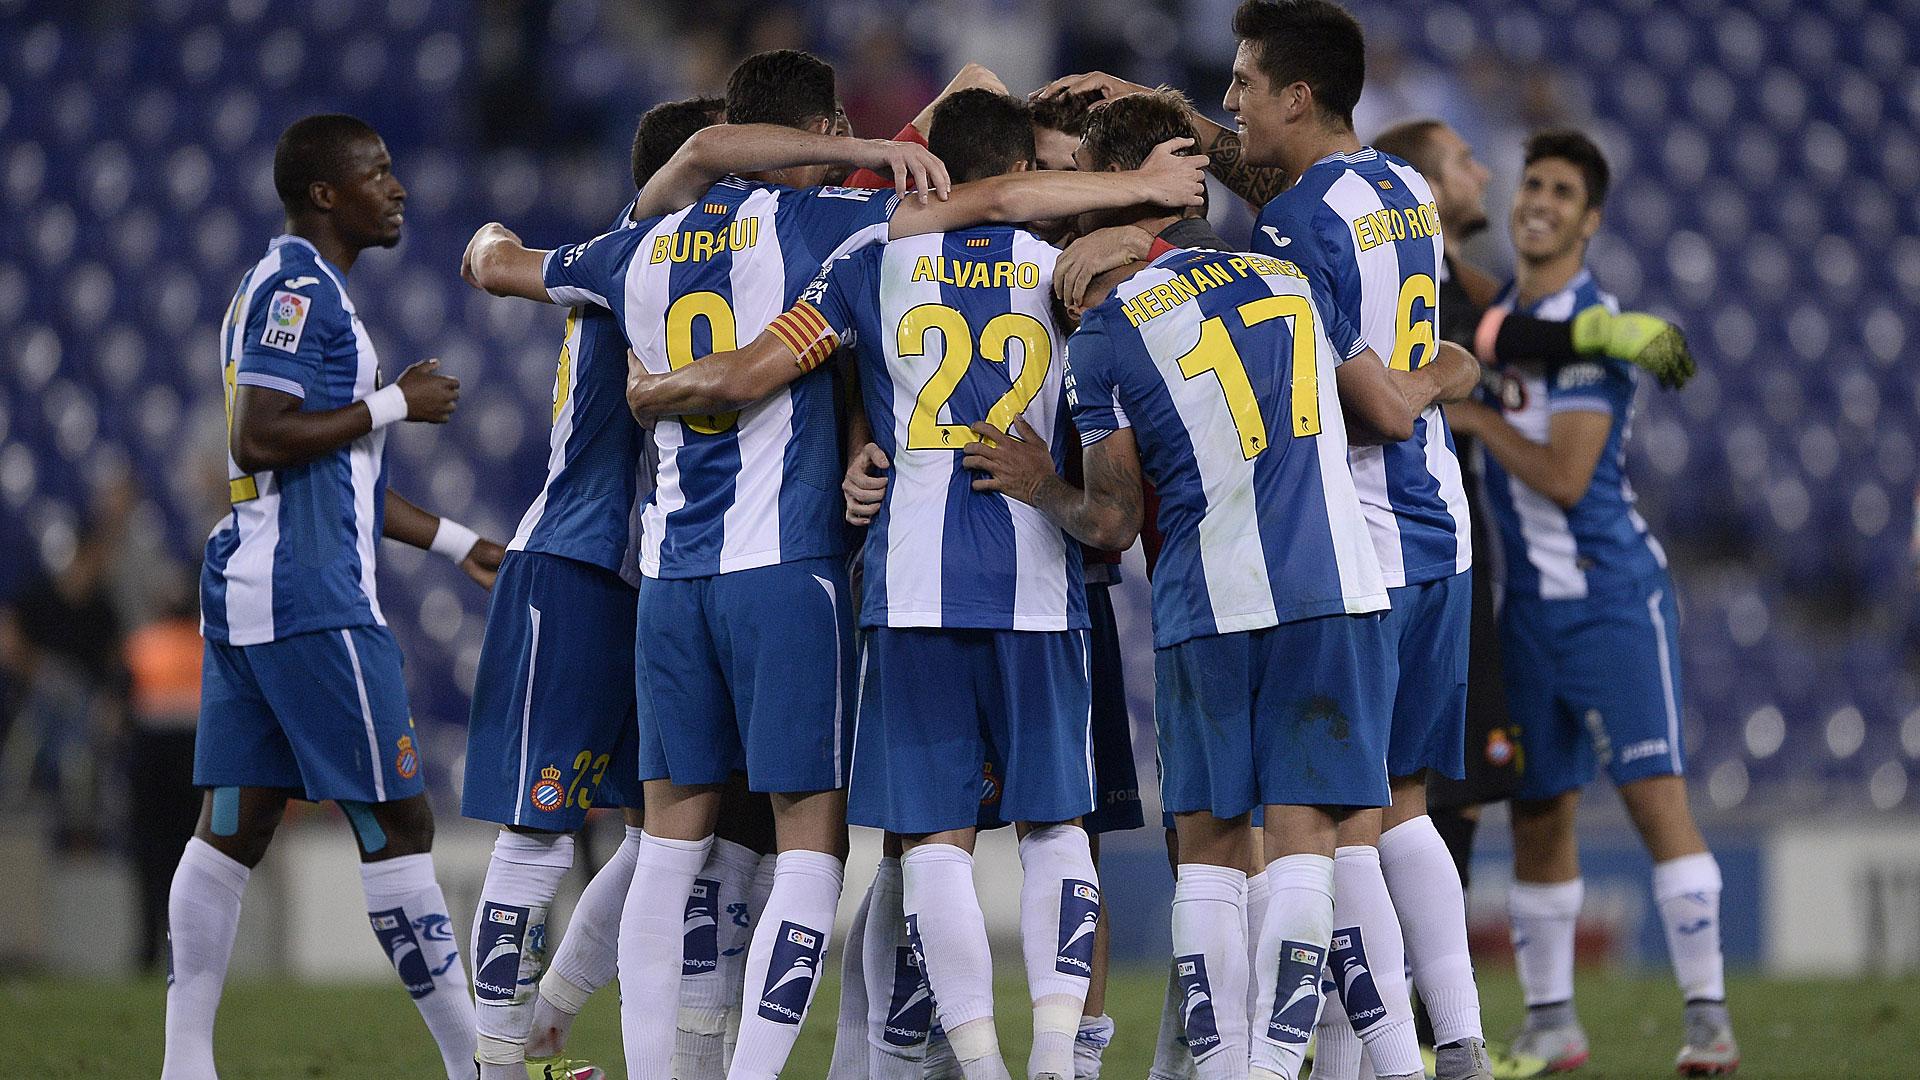 Video: Espanyol vs Las Palmas